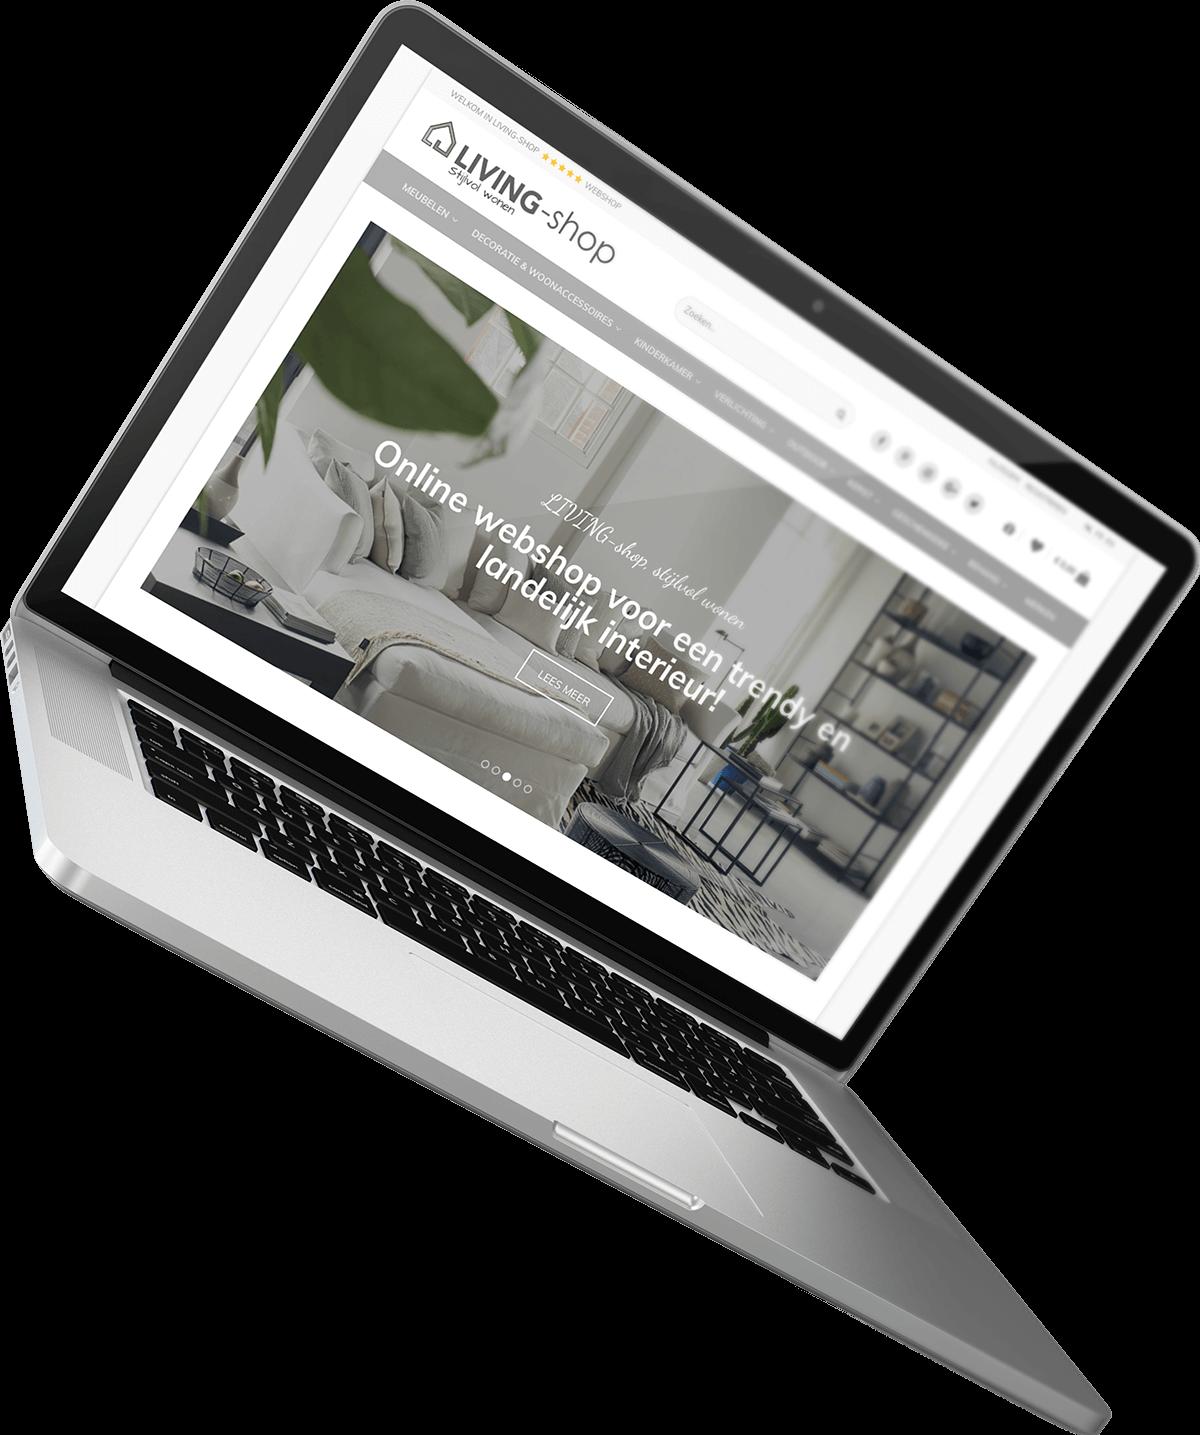 webshop-Living-Shop-overzicht.png